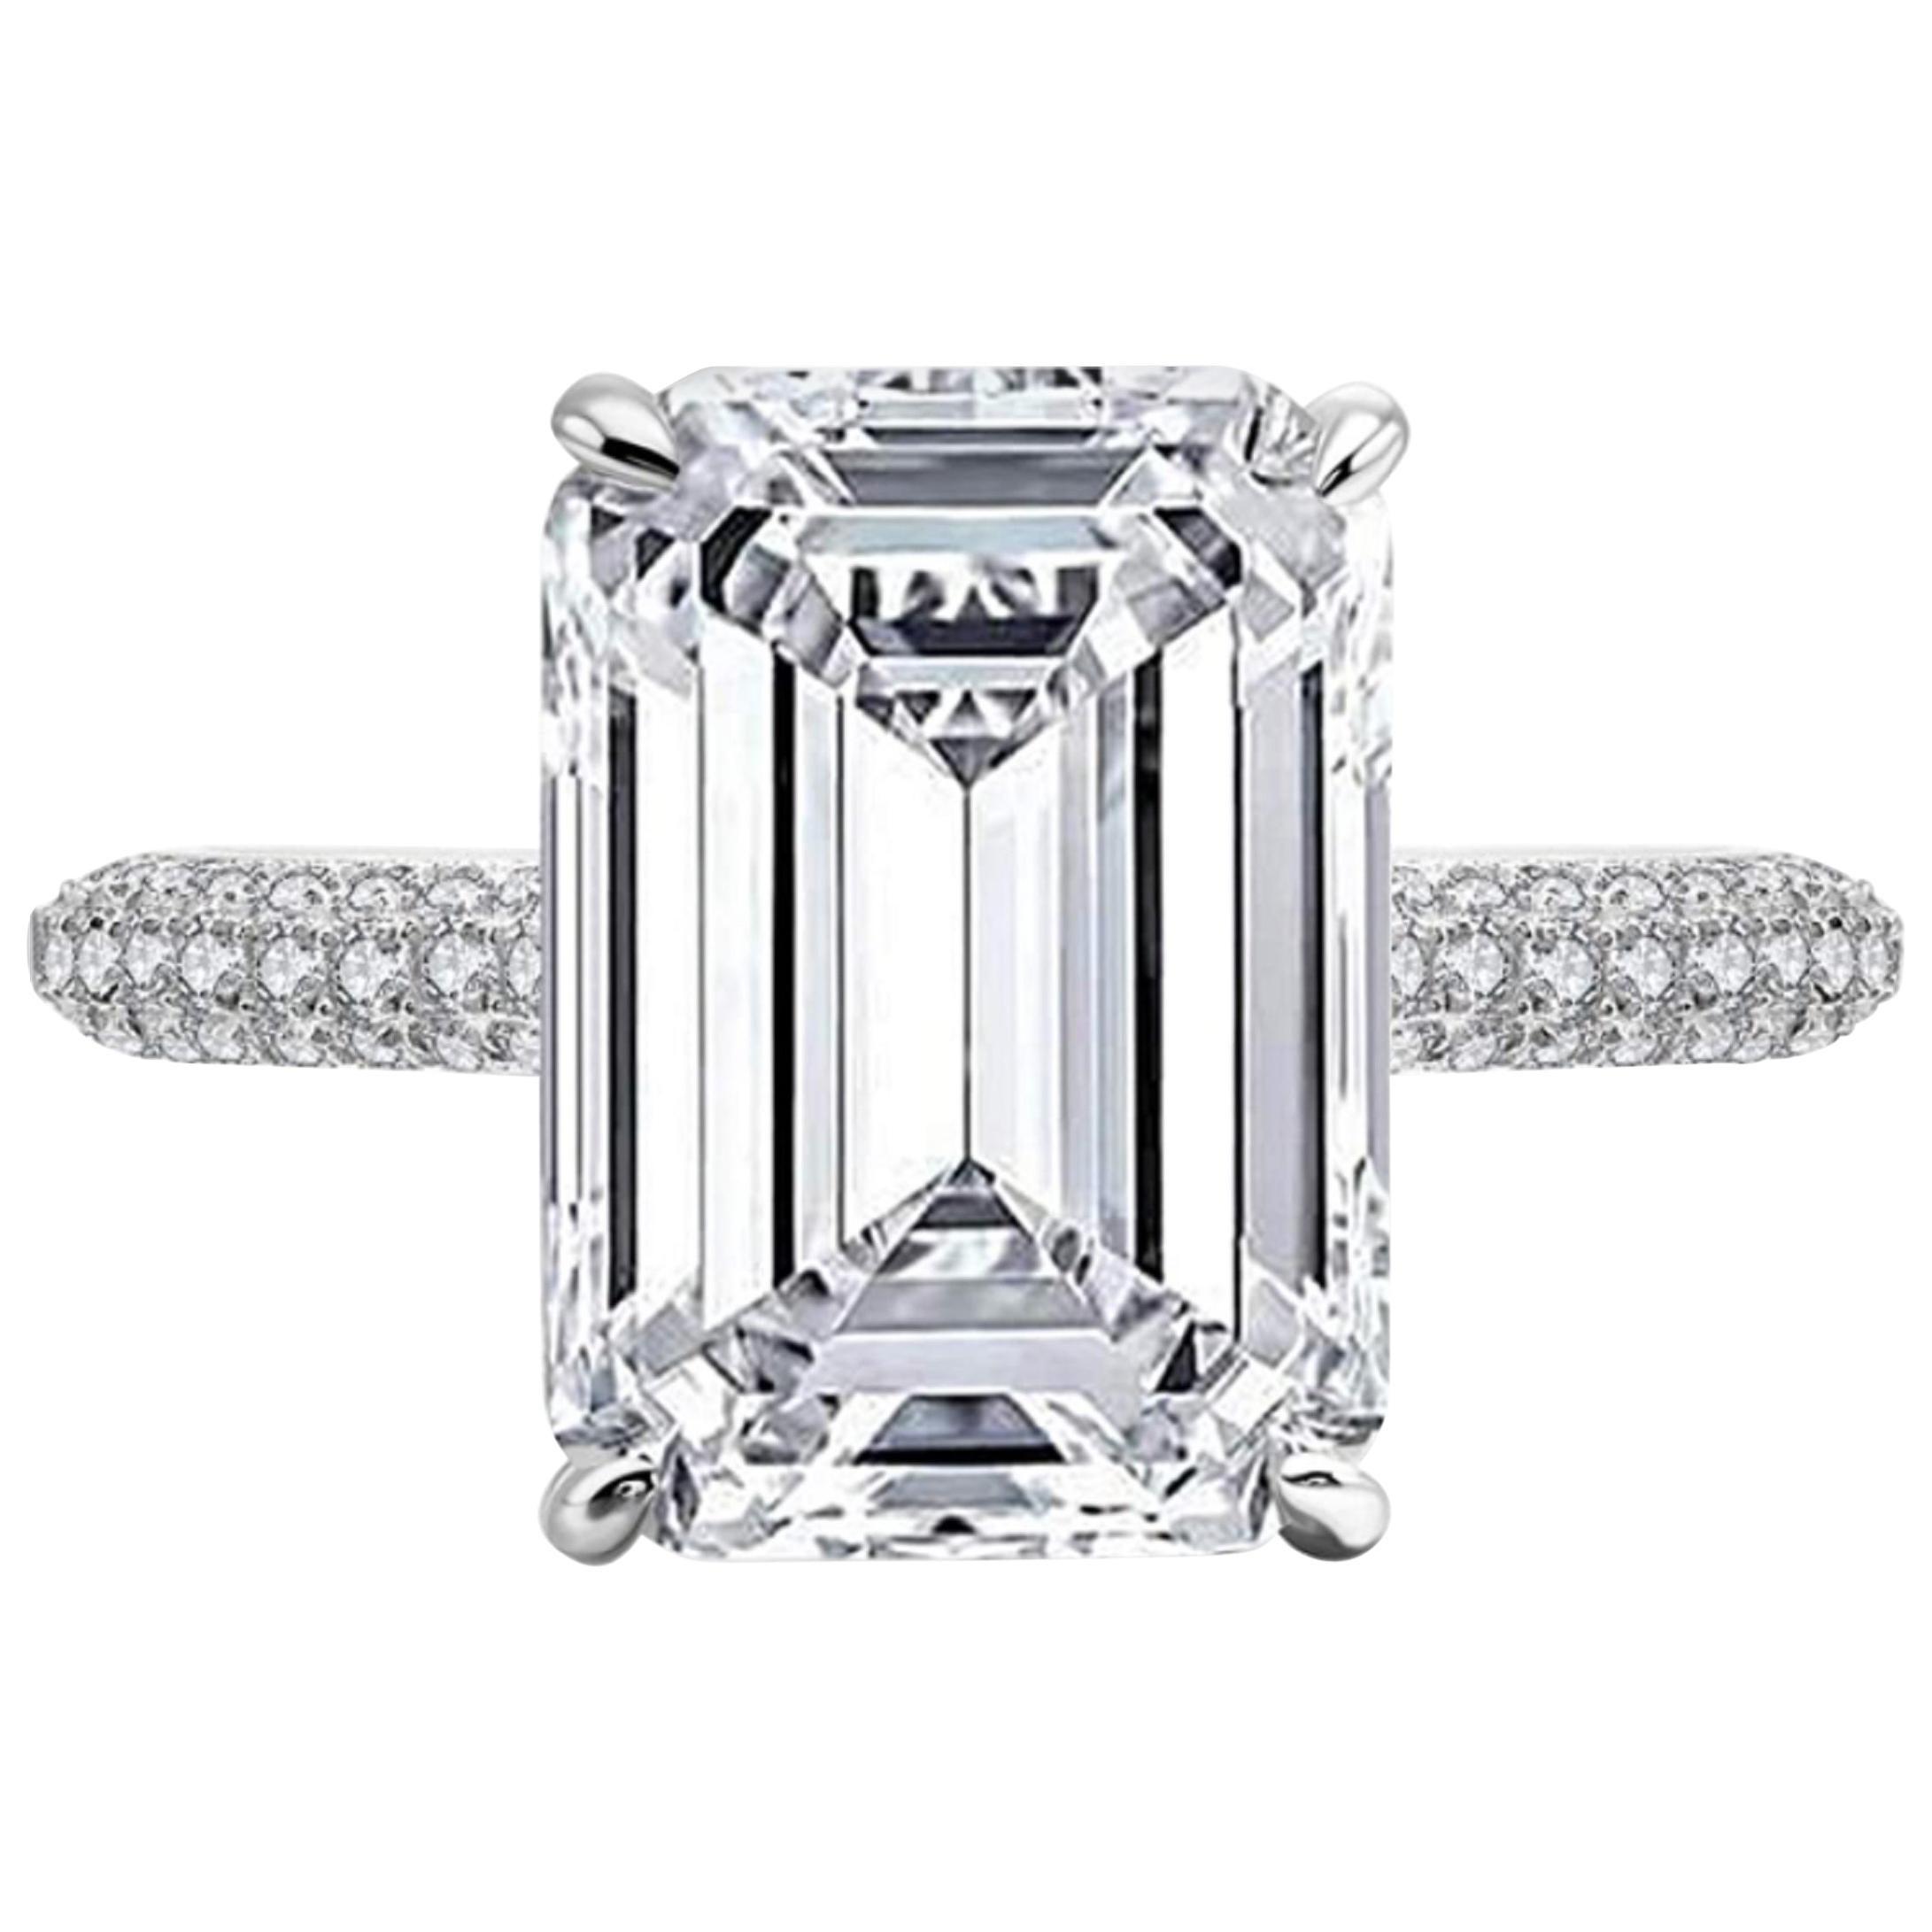 GIA Certified 3.20 Carat Emerald Cut Diamond Ring